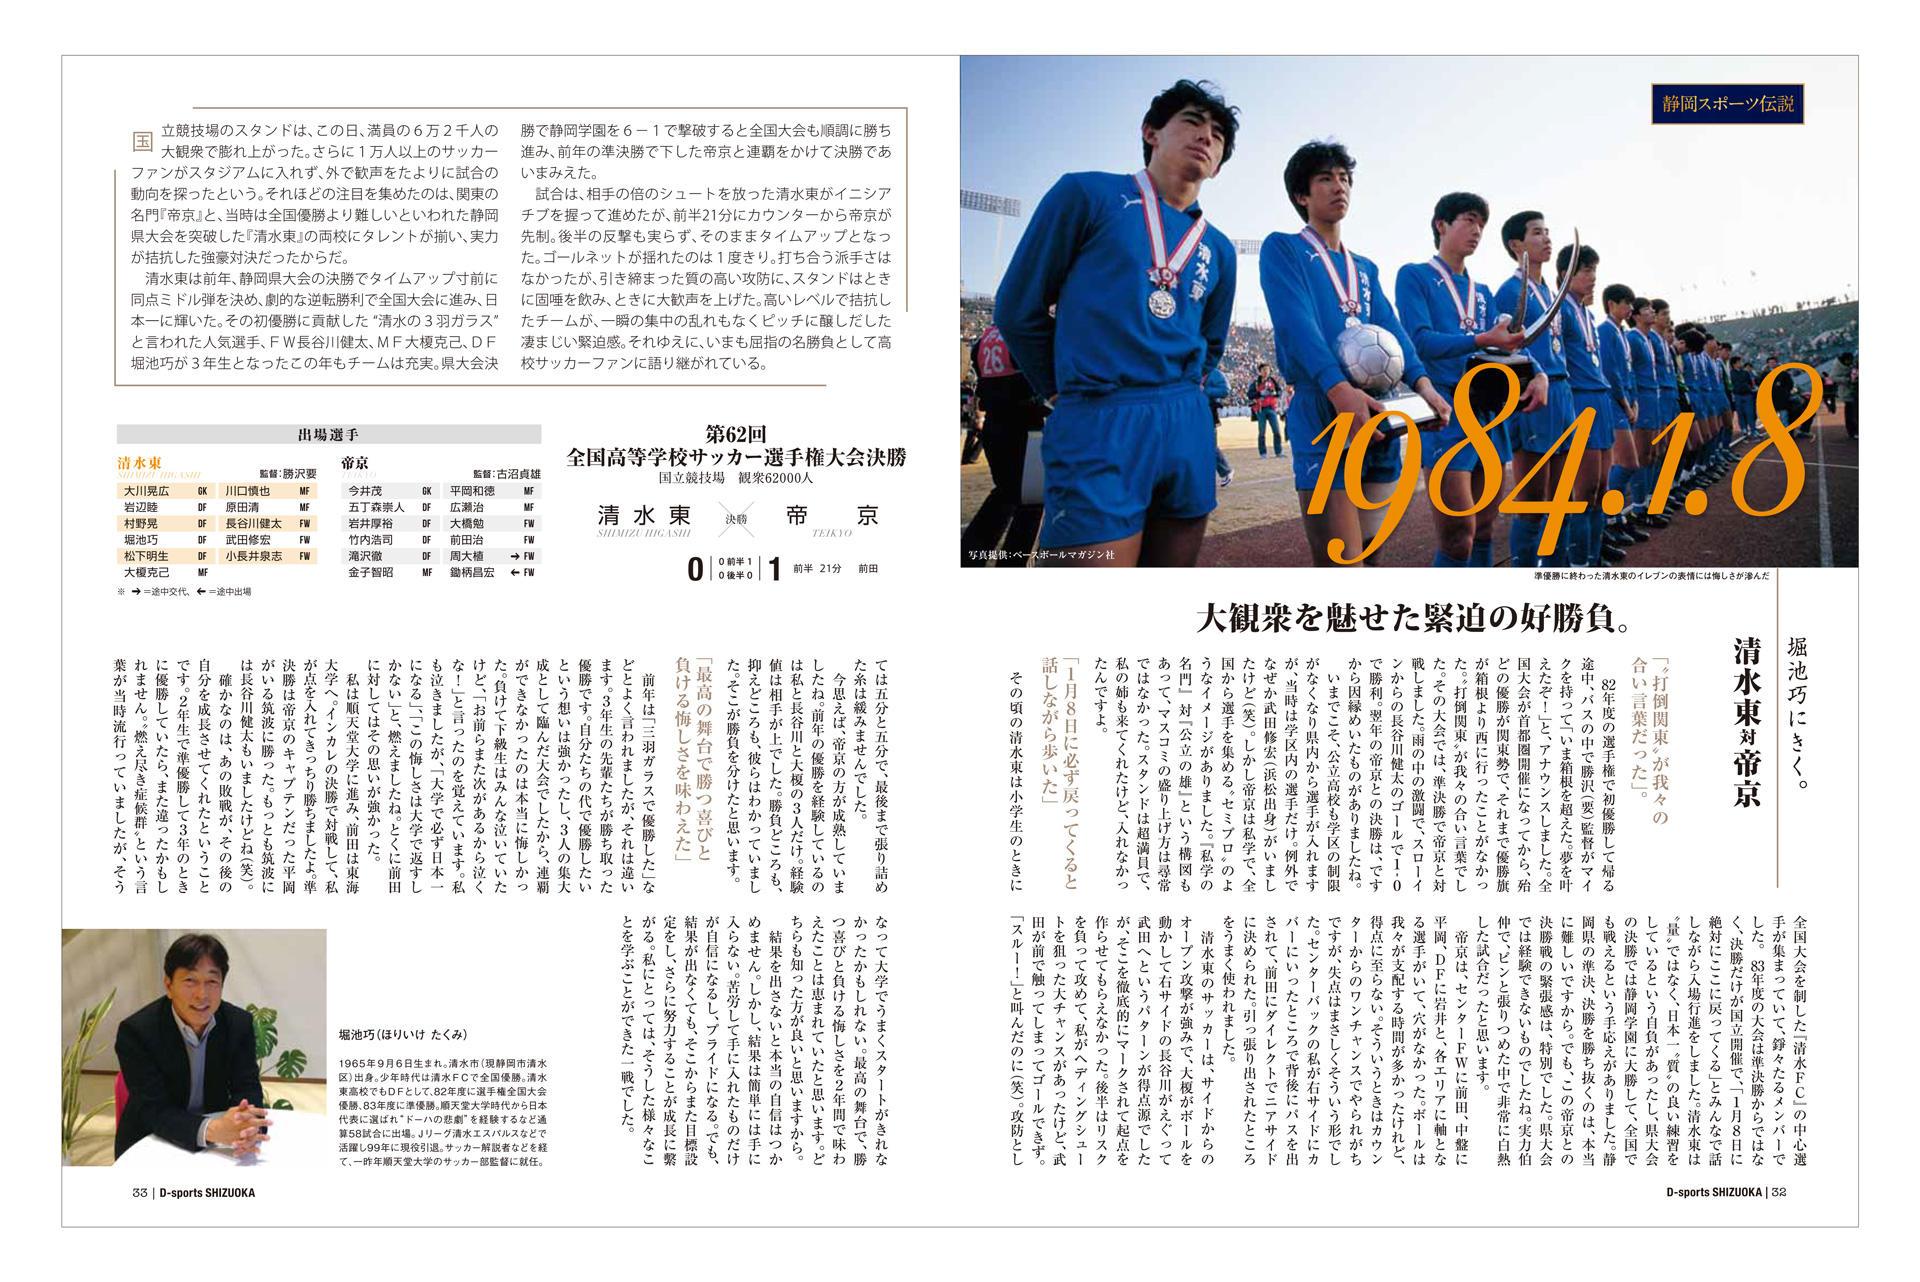 http://d-sports.shizuokastandard.jp/article/2016/shimizuhigasgi_teikyo.jpg